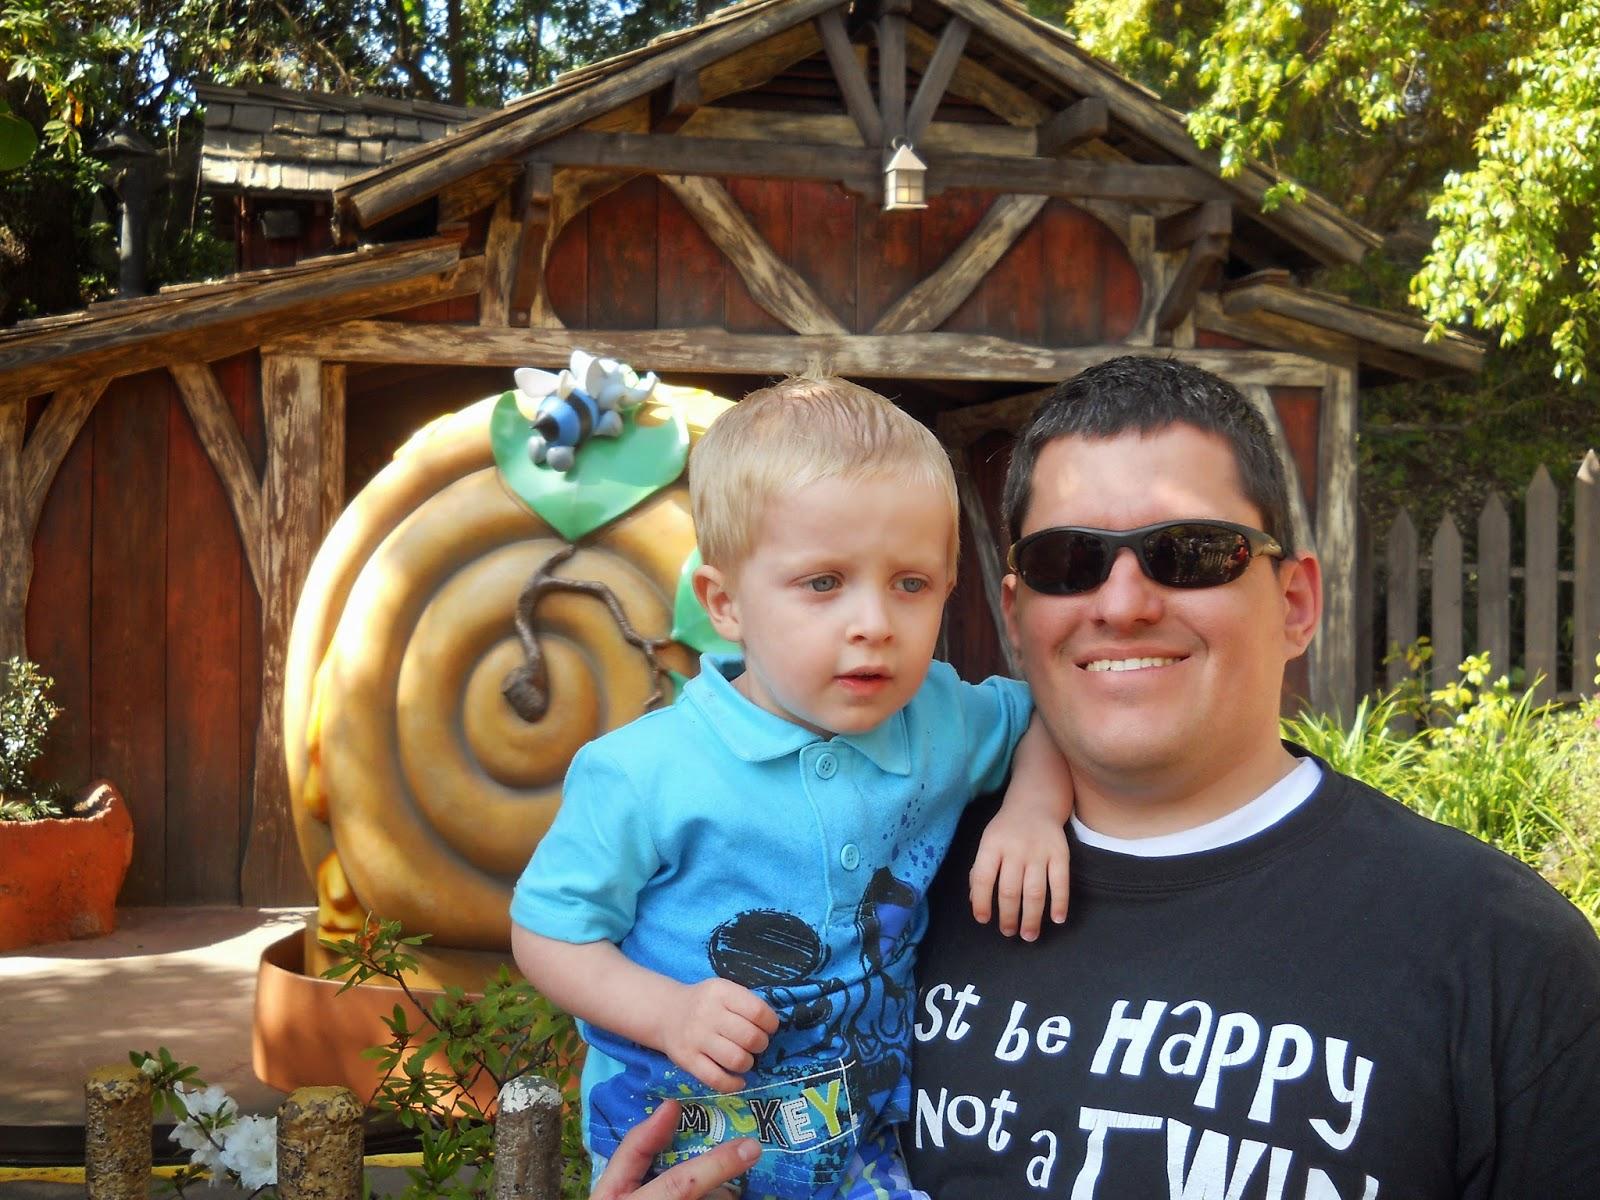 Little kids enjoy Winnie the Pooh and other rides at Disneyland. LoveOurDisney.com